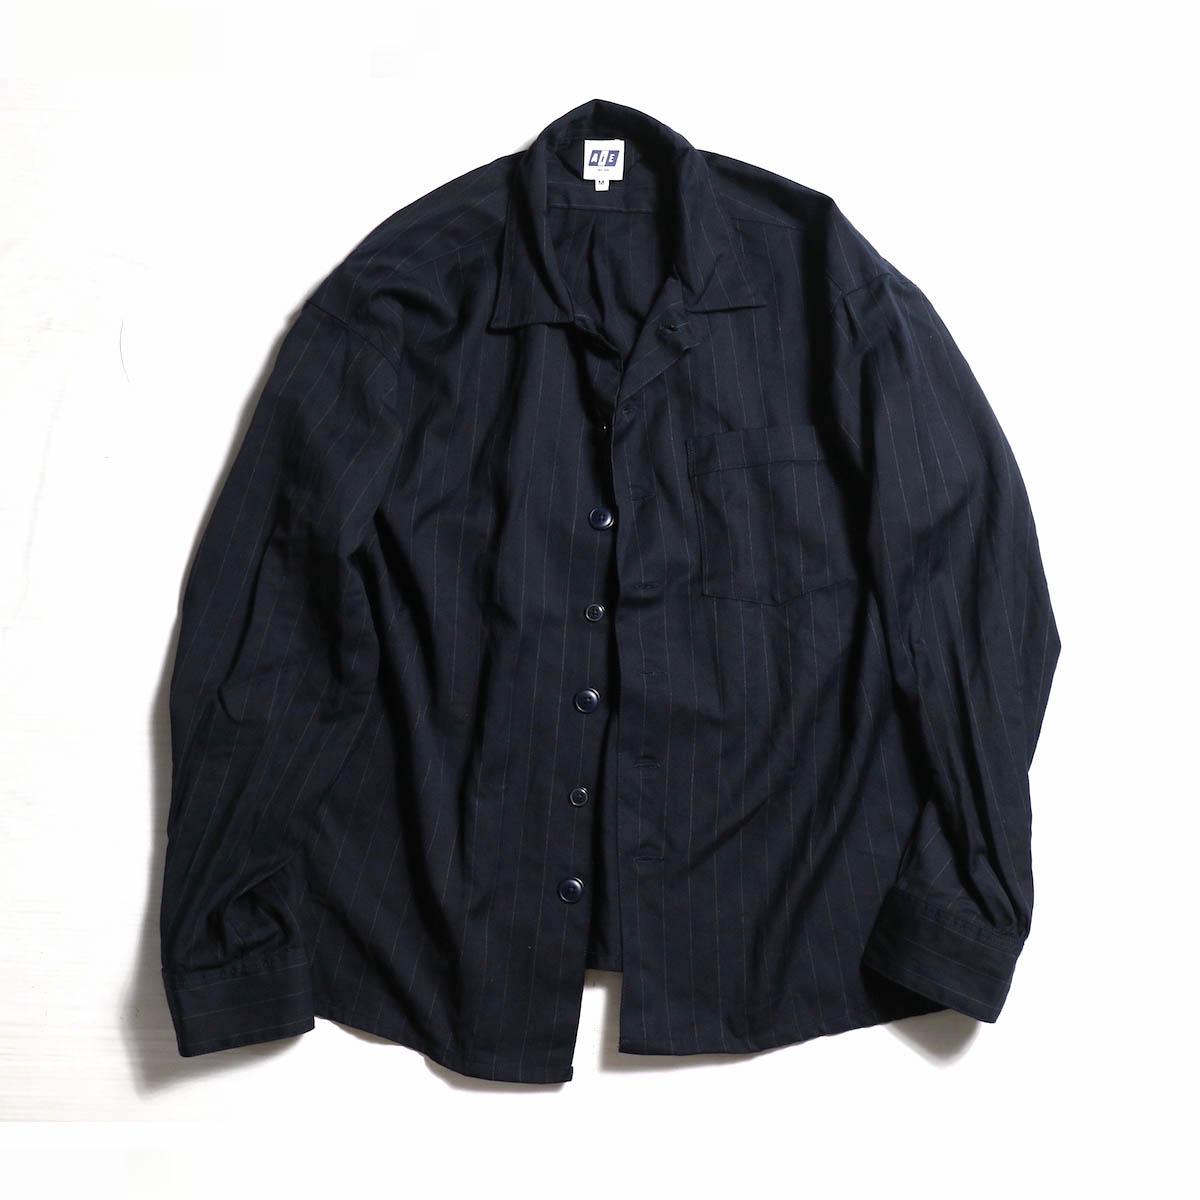 AiE / PJ Shirt -St.Wool